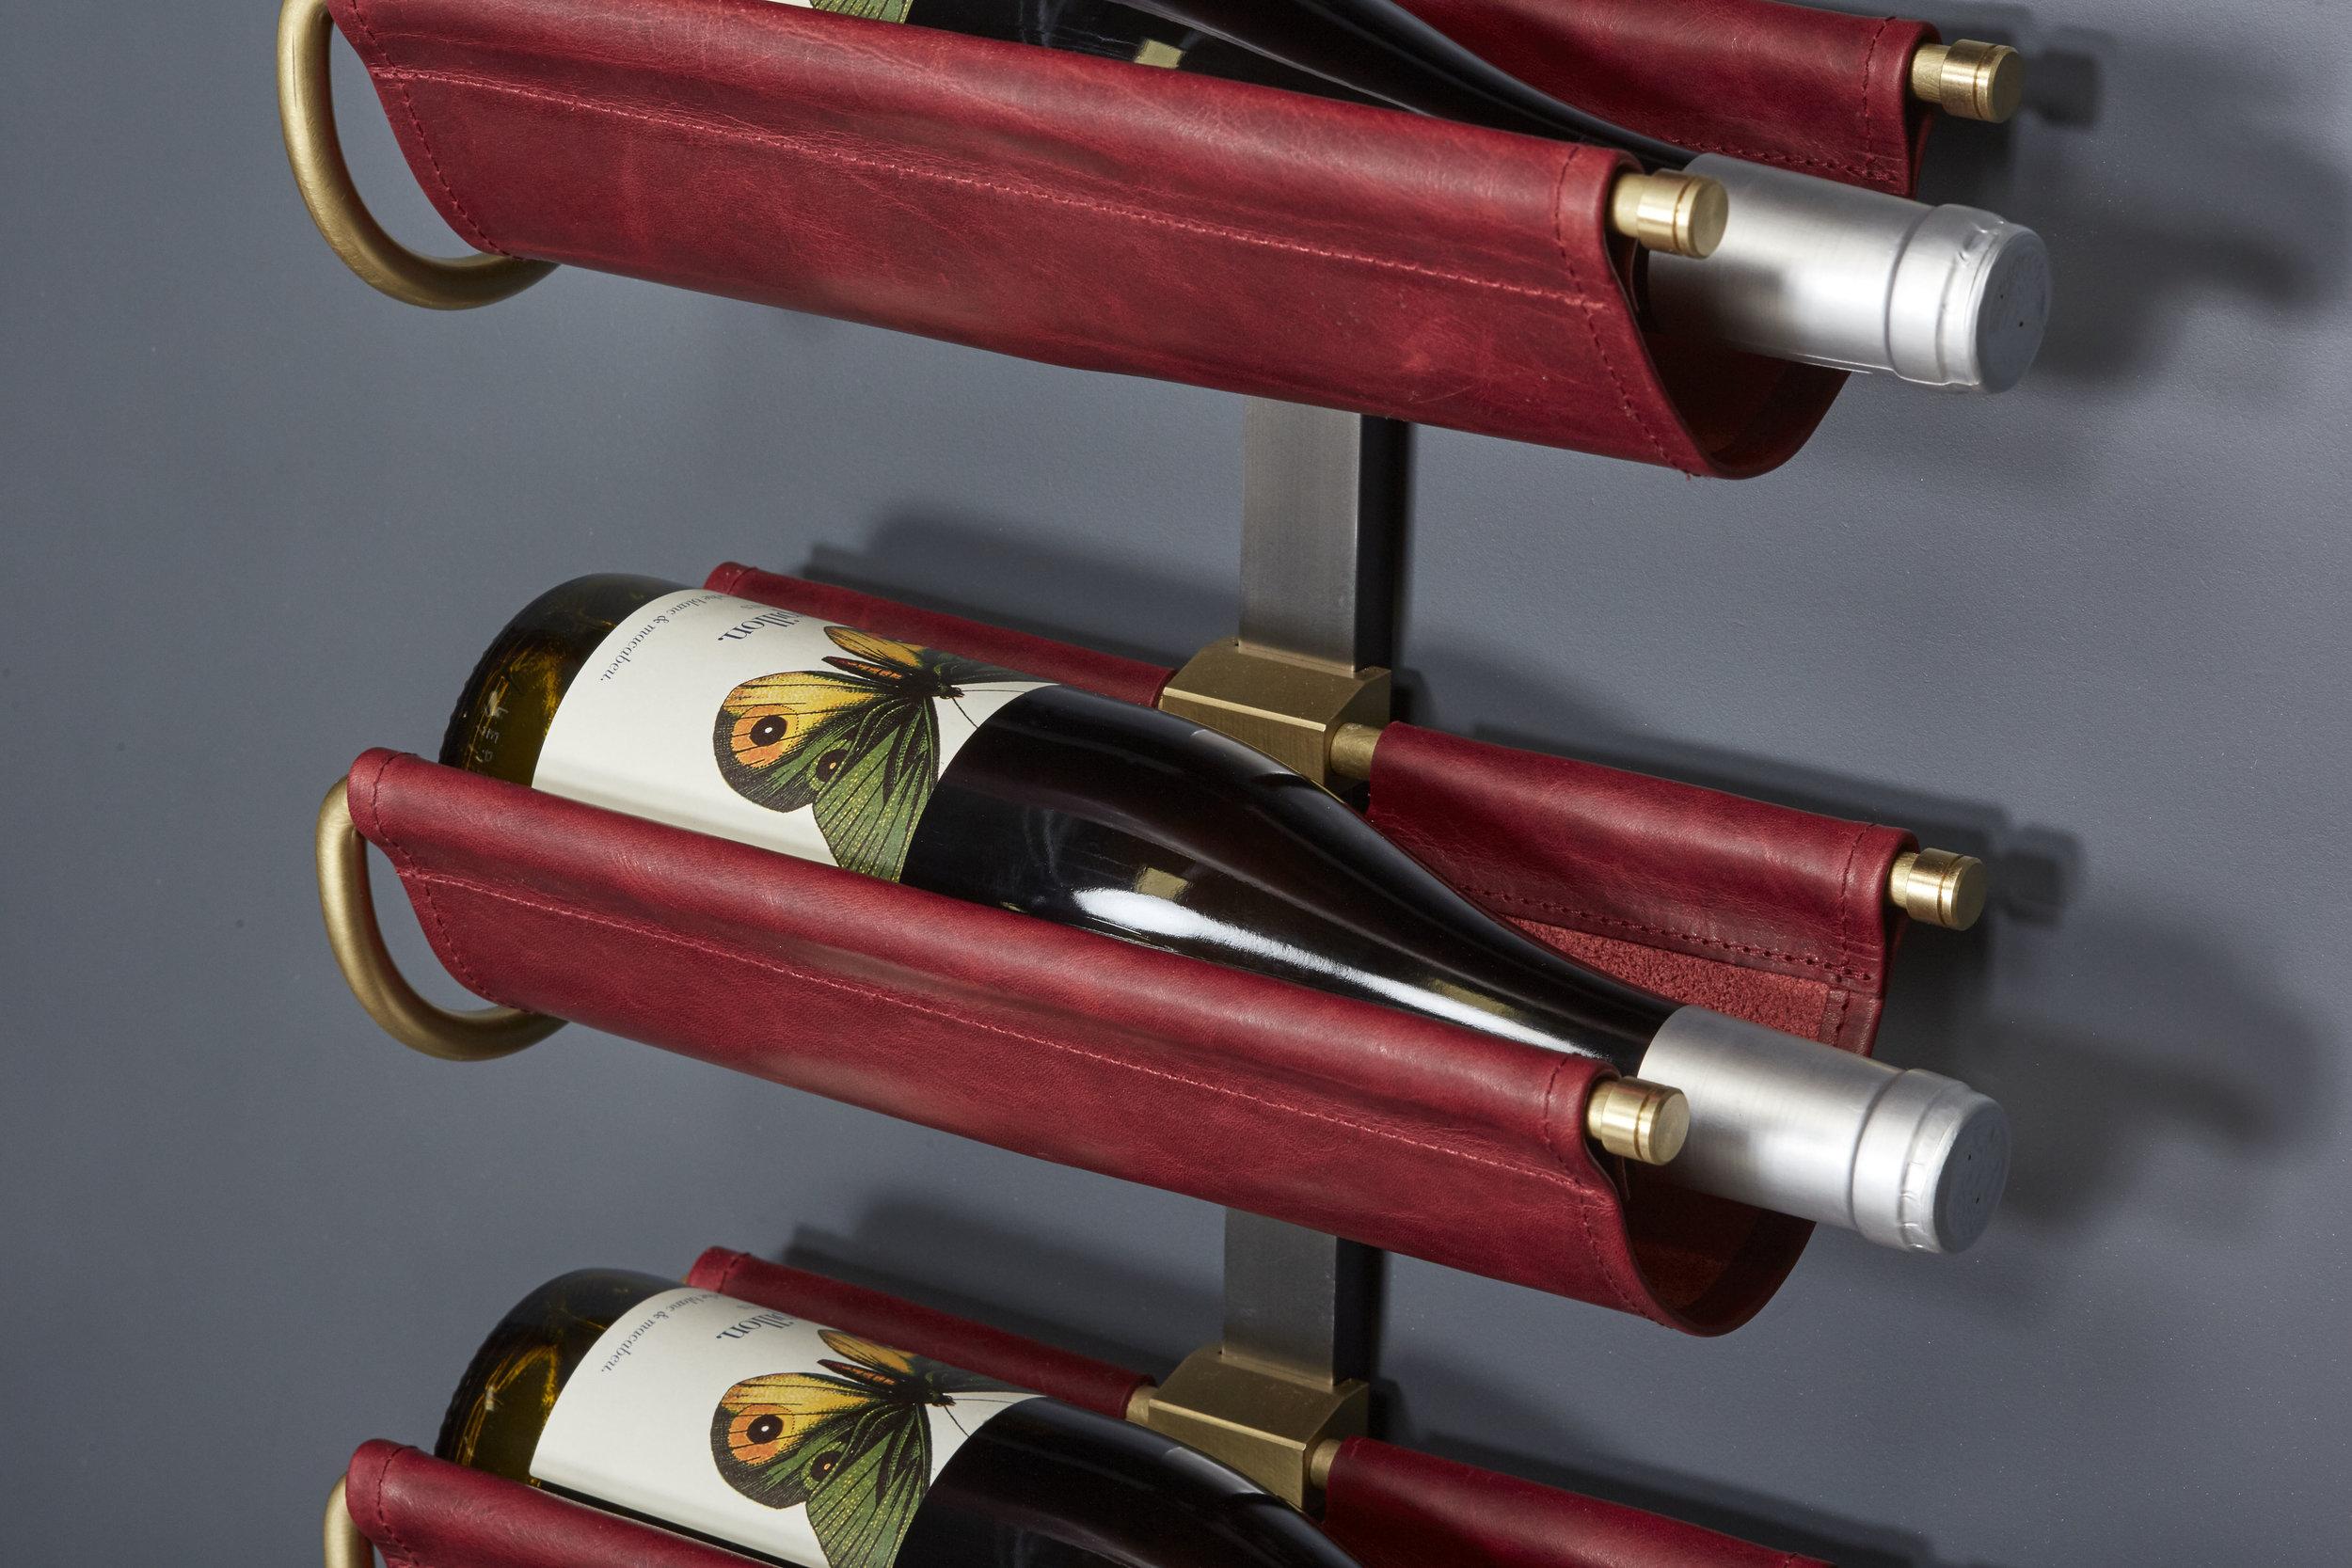 Wine-Racks-Red-leather-detail-3-credenza_0350.jpg